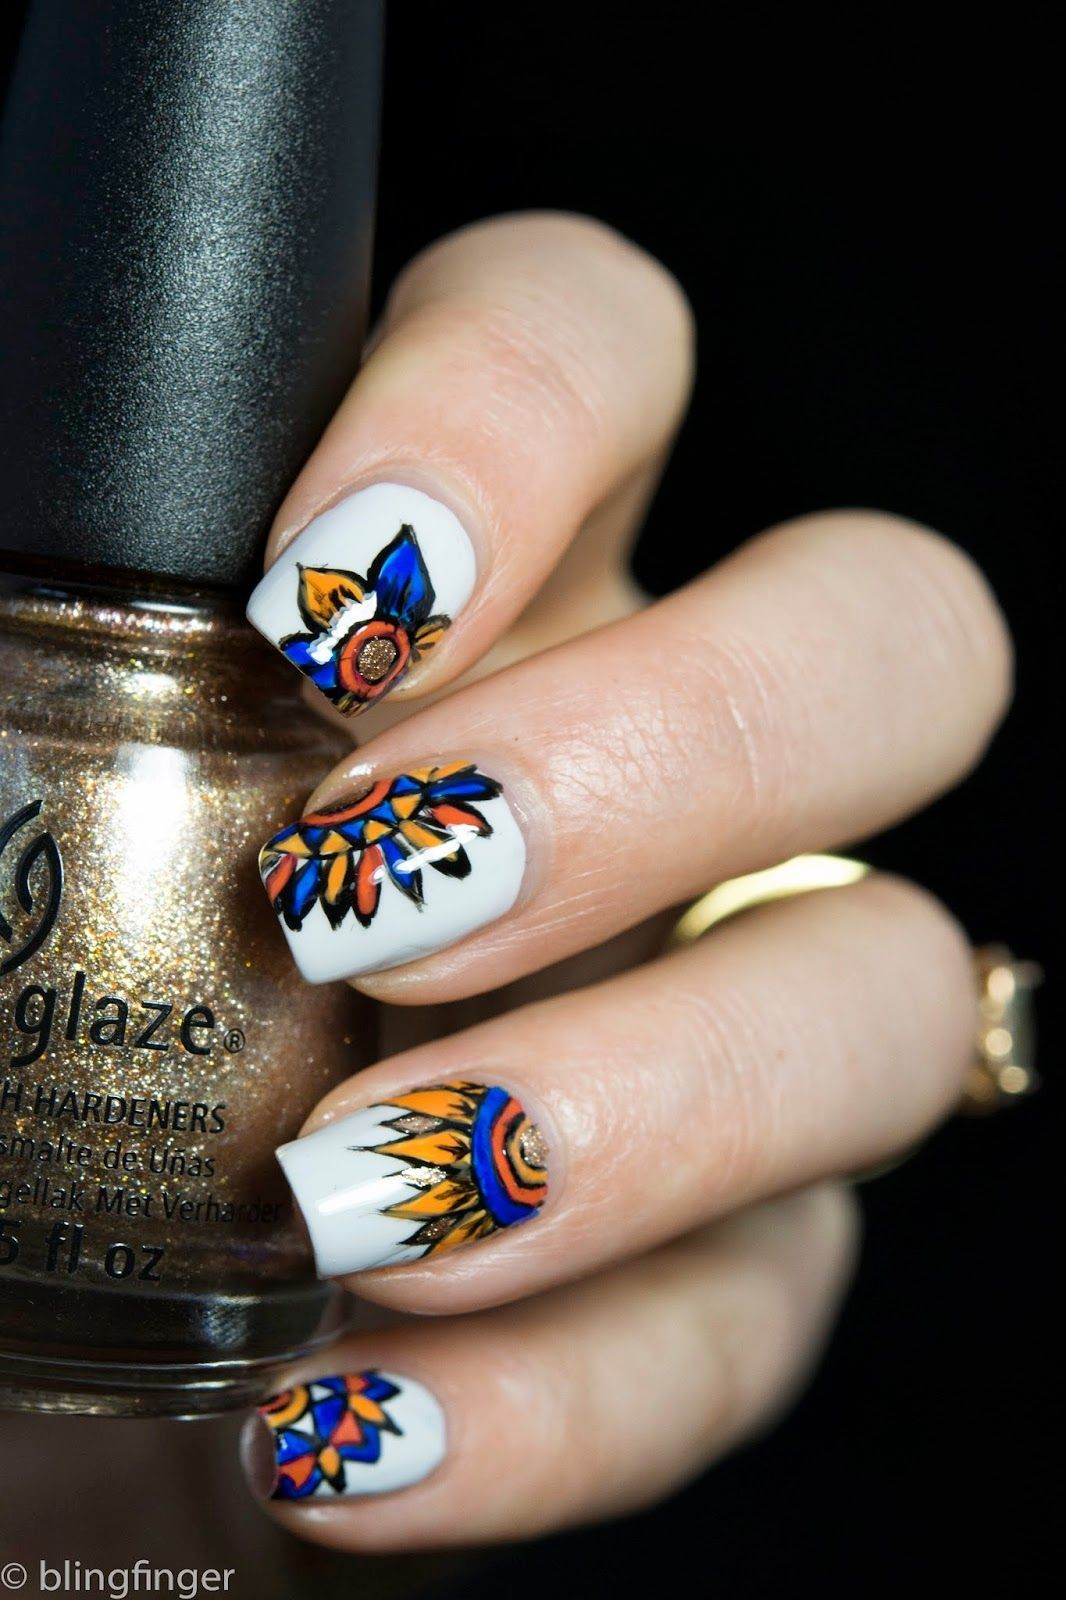 lotus flower bomb. Flower nails, Nails, Flower nail art